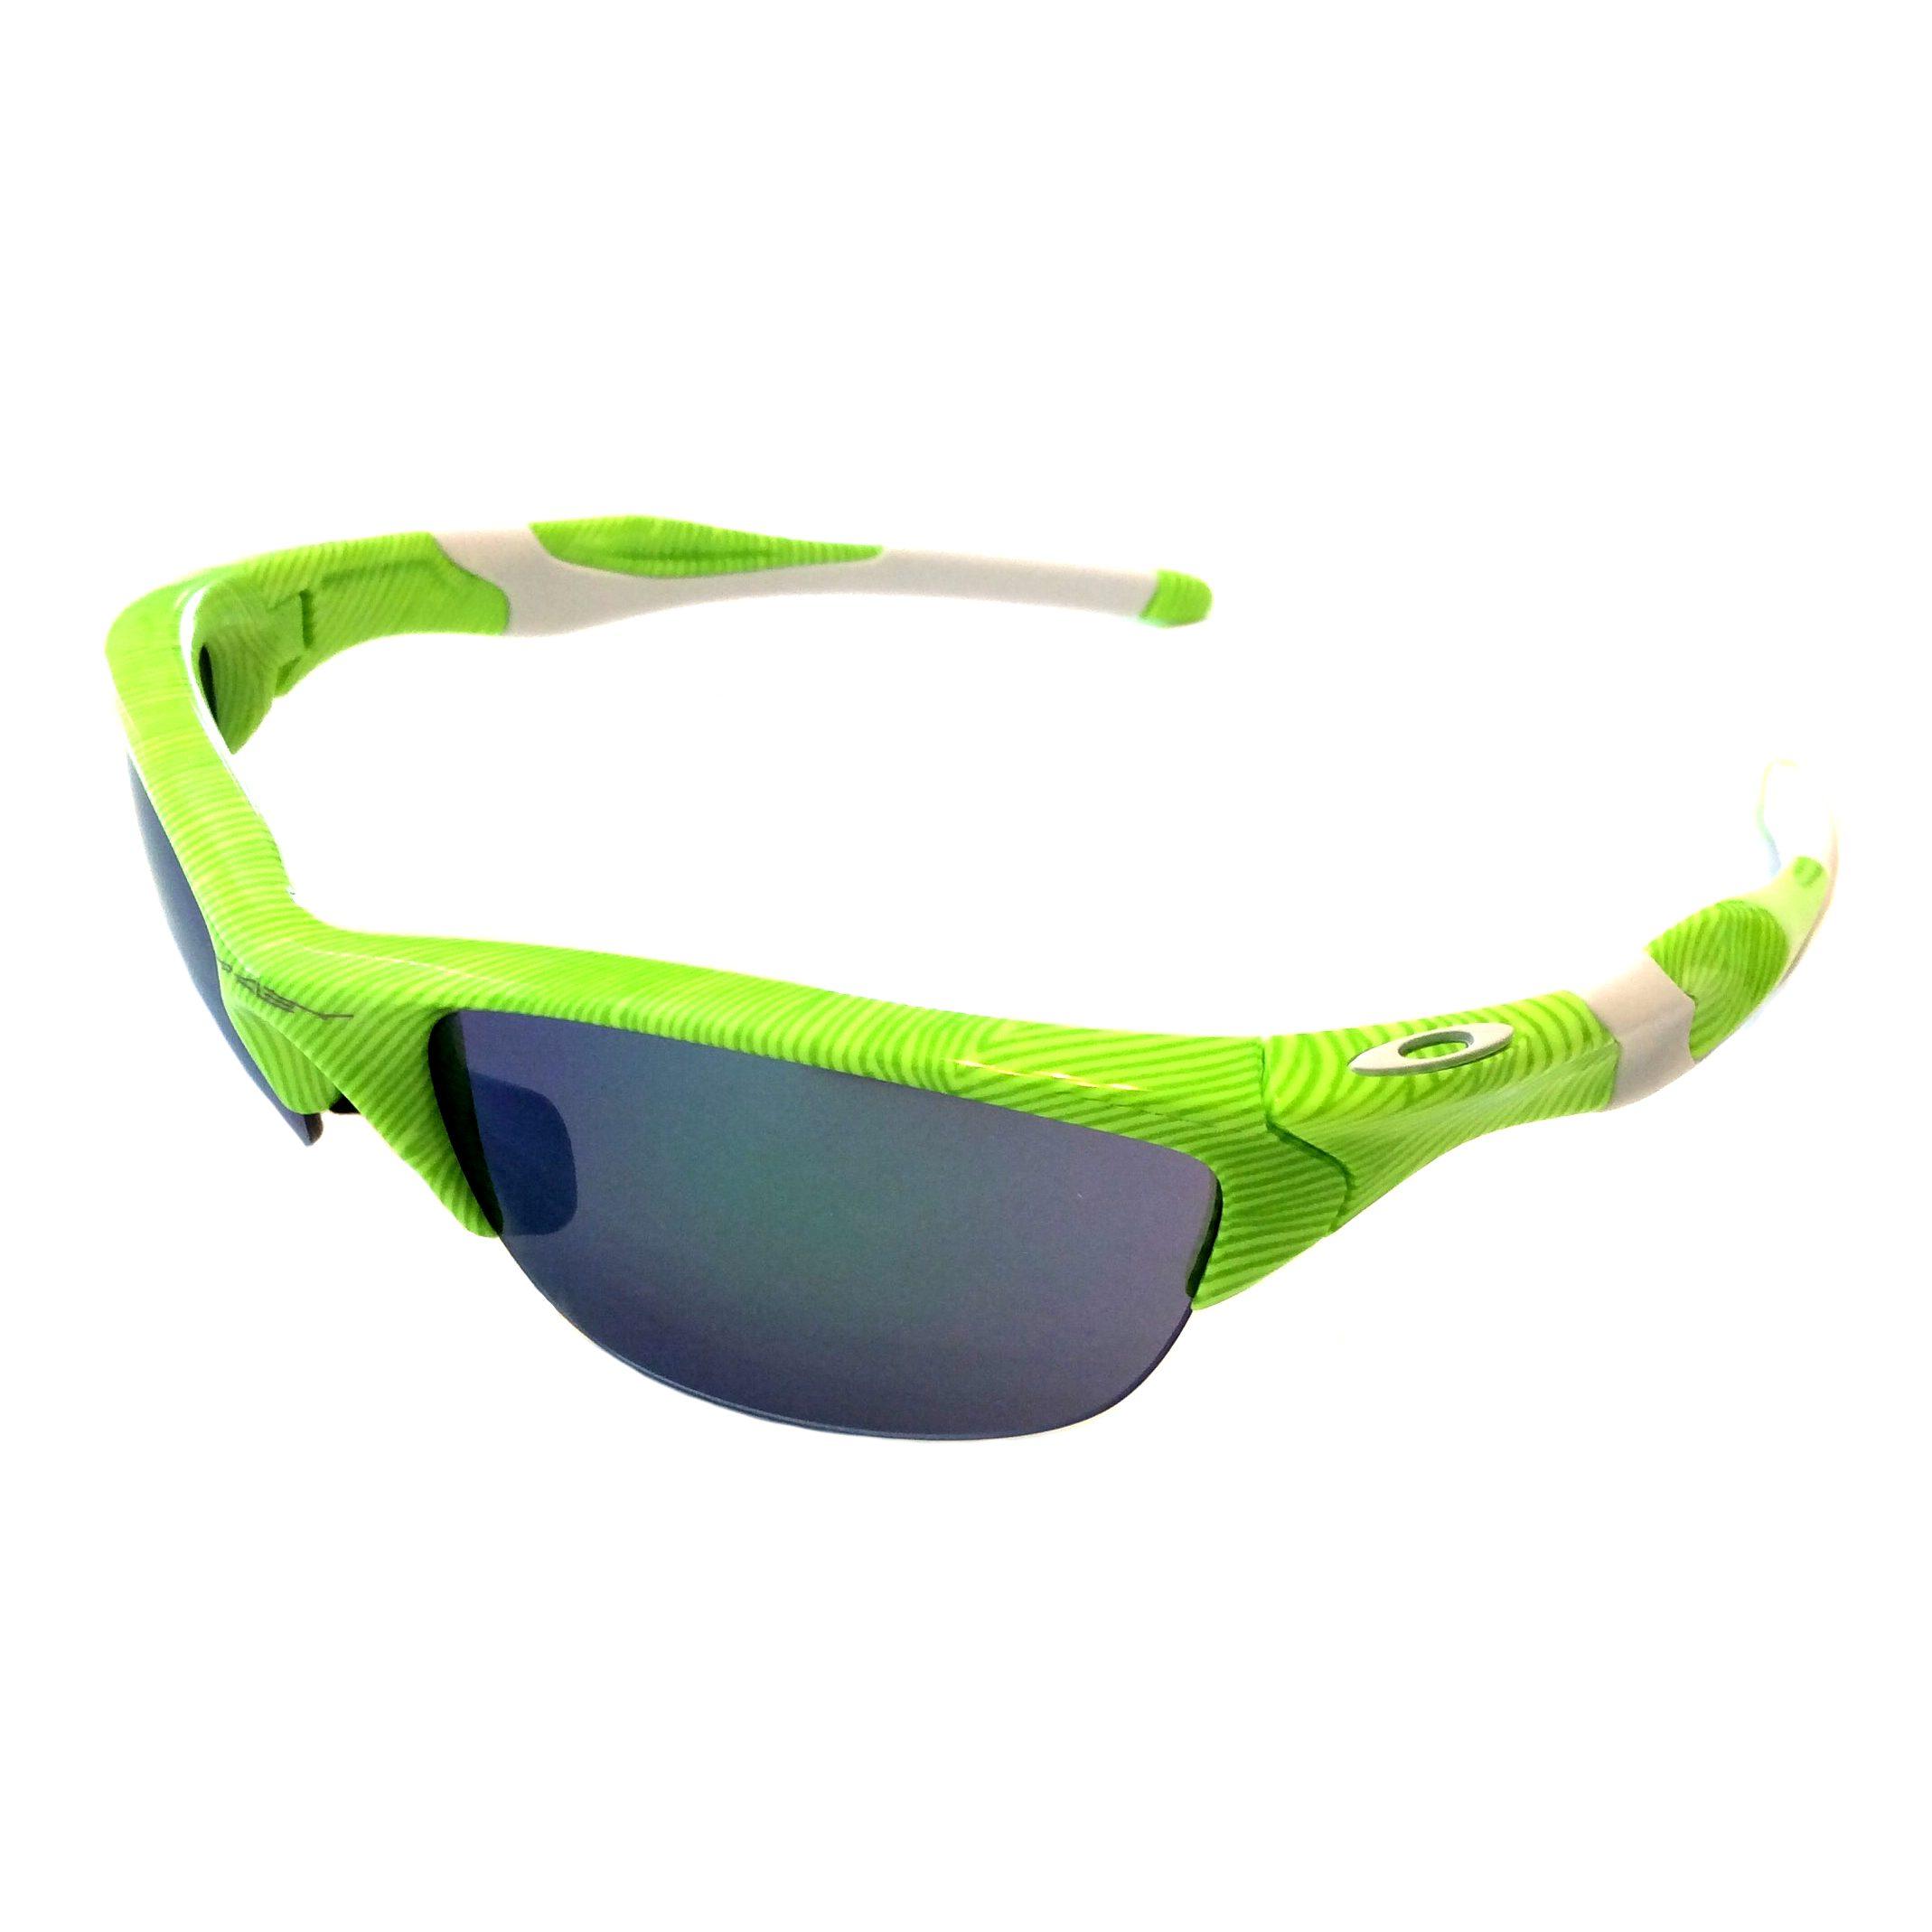 25aa50cdef Oakley Half Jacket 2.0 Sunglasses - Fingerprint Retina Burn Green Jade  Iridium (A)